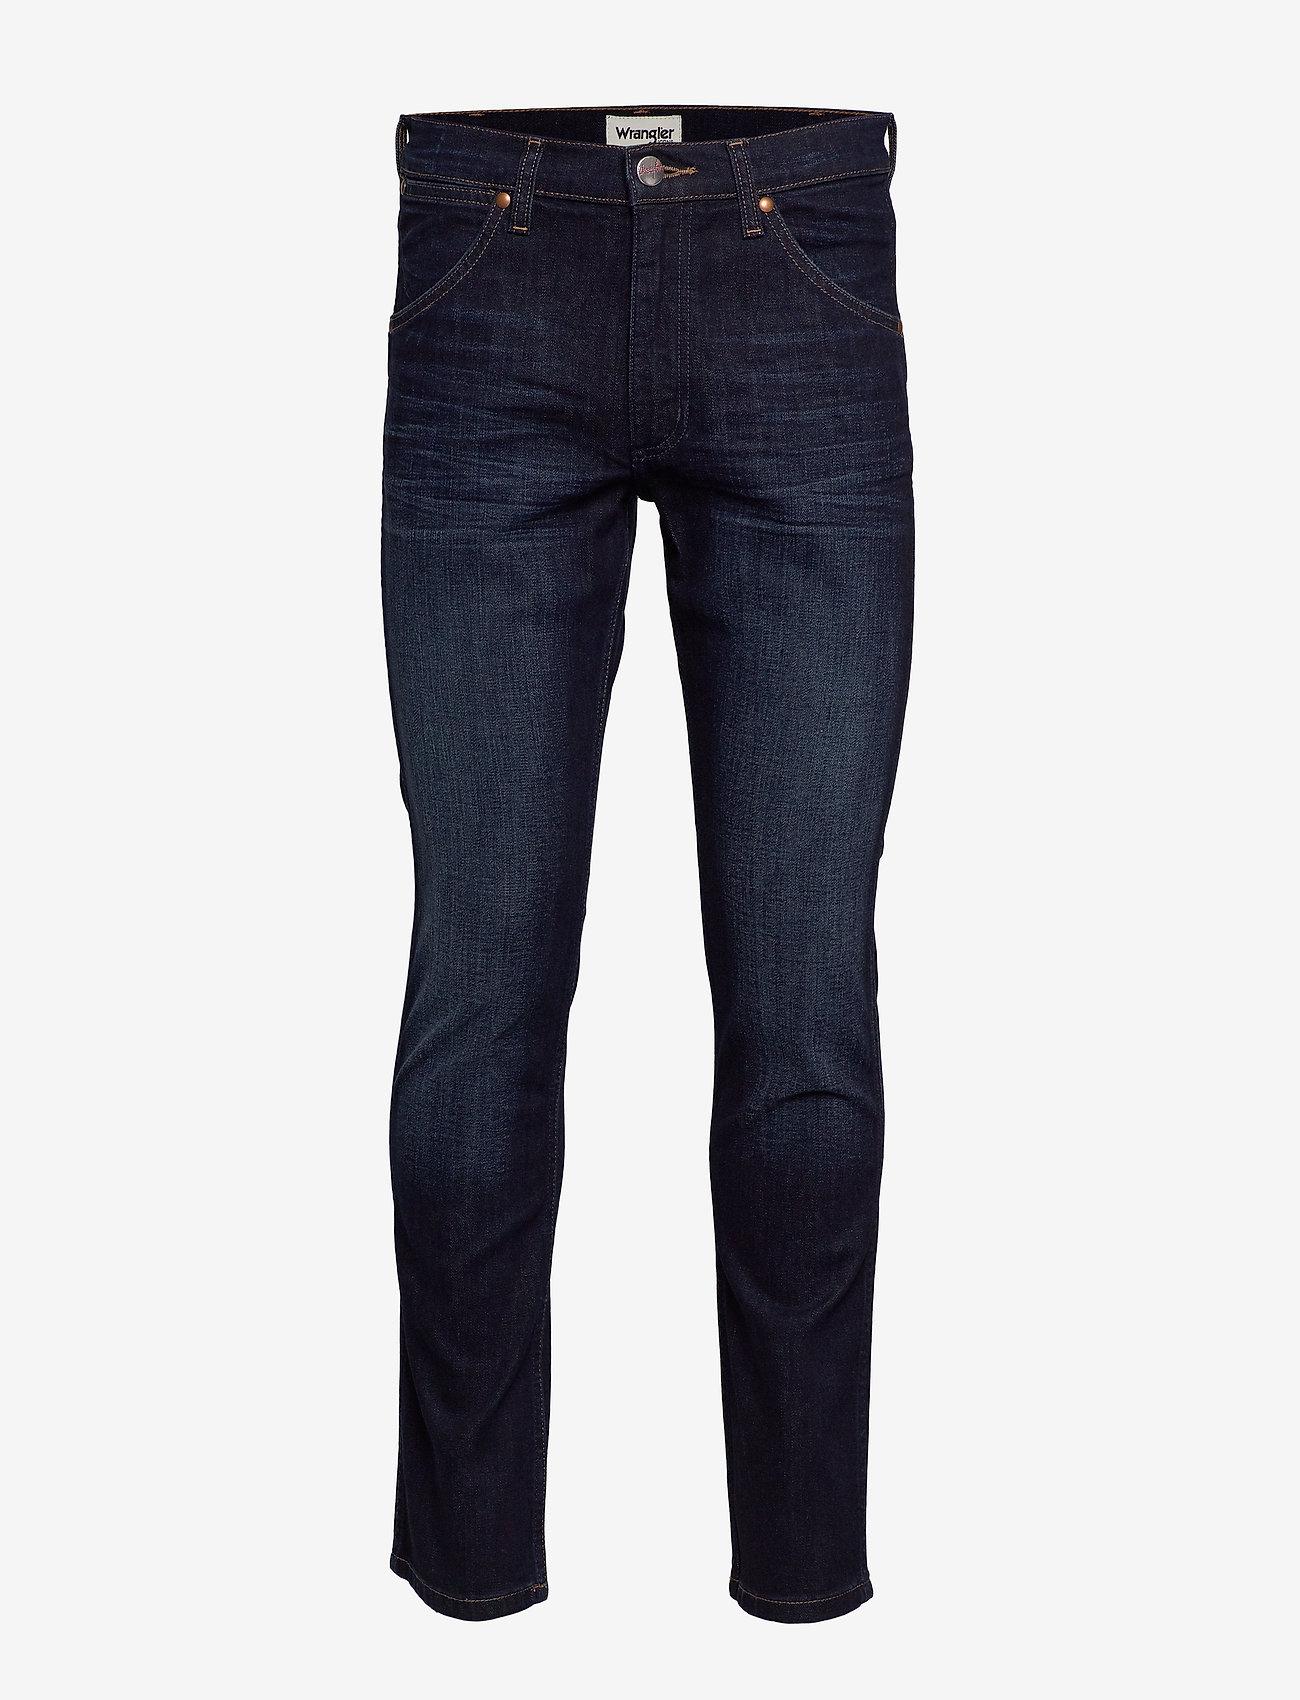 Wrangler 11MWZ - Jeans DARK ICON UMe9gtlM